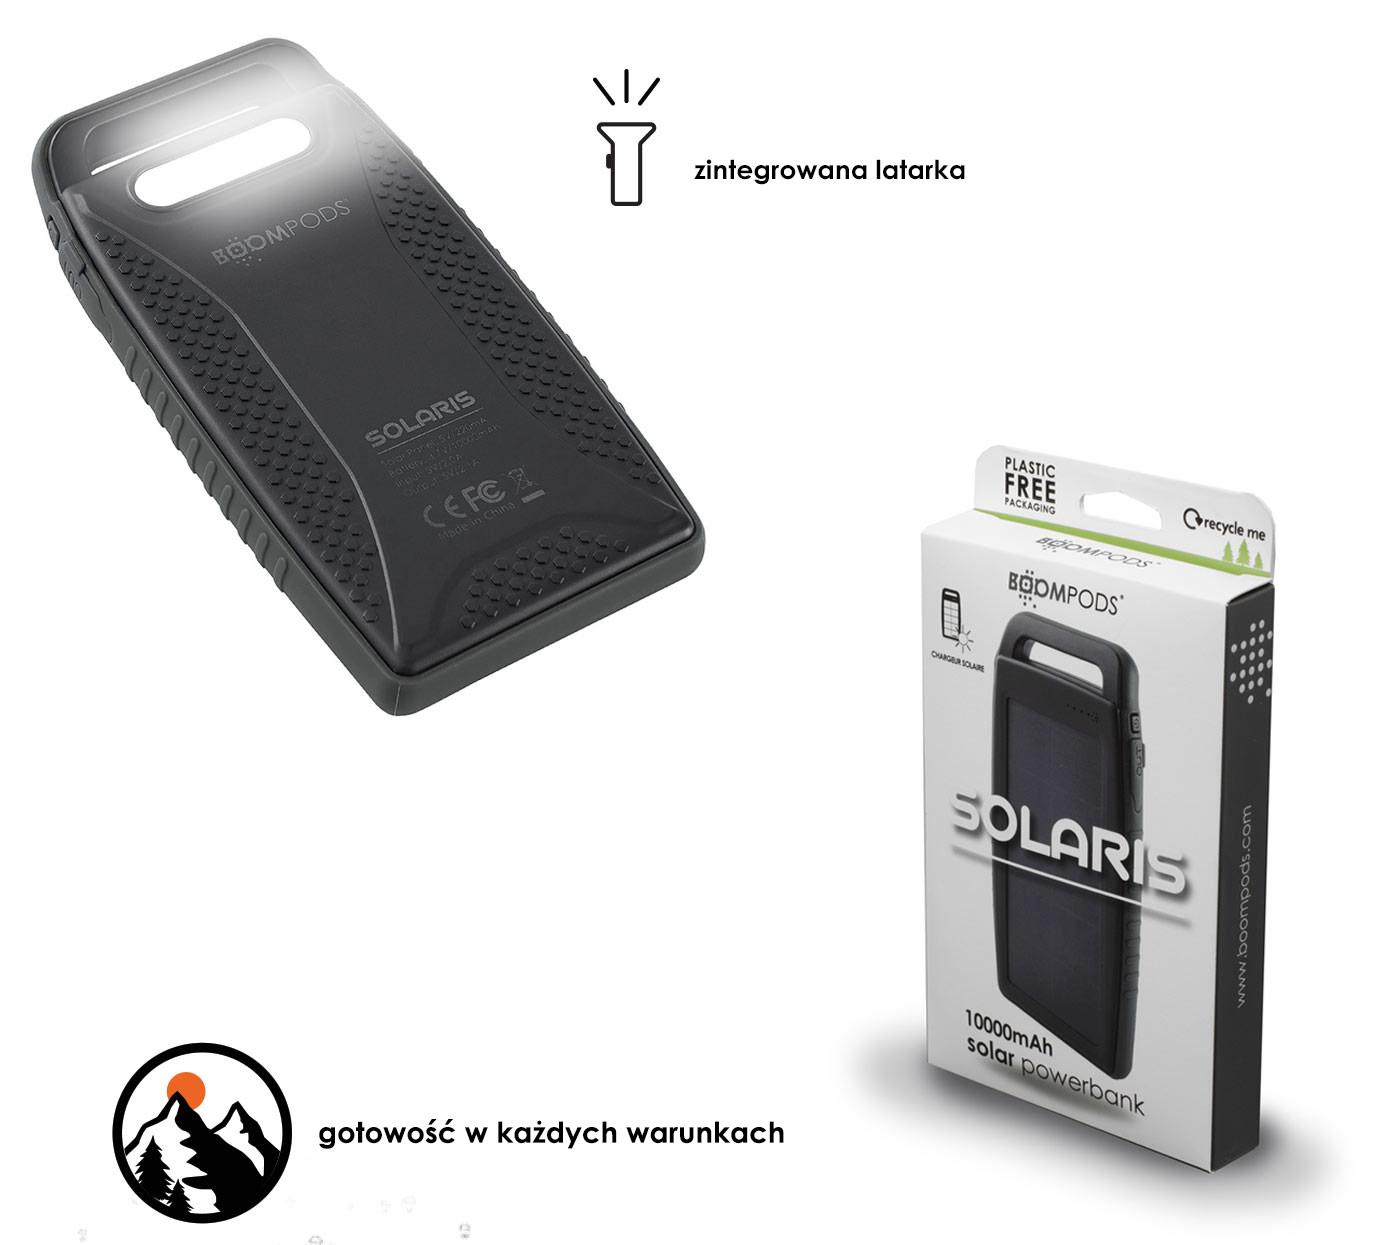 solarny powerbank Solaris 10000 mAH